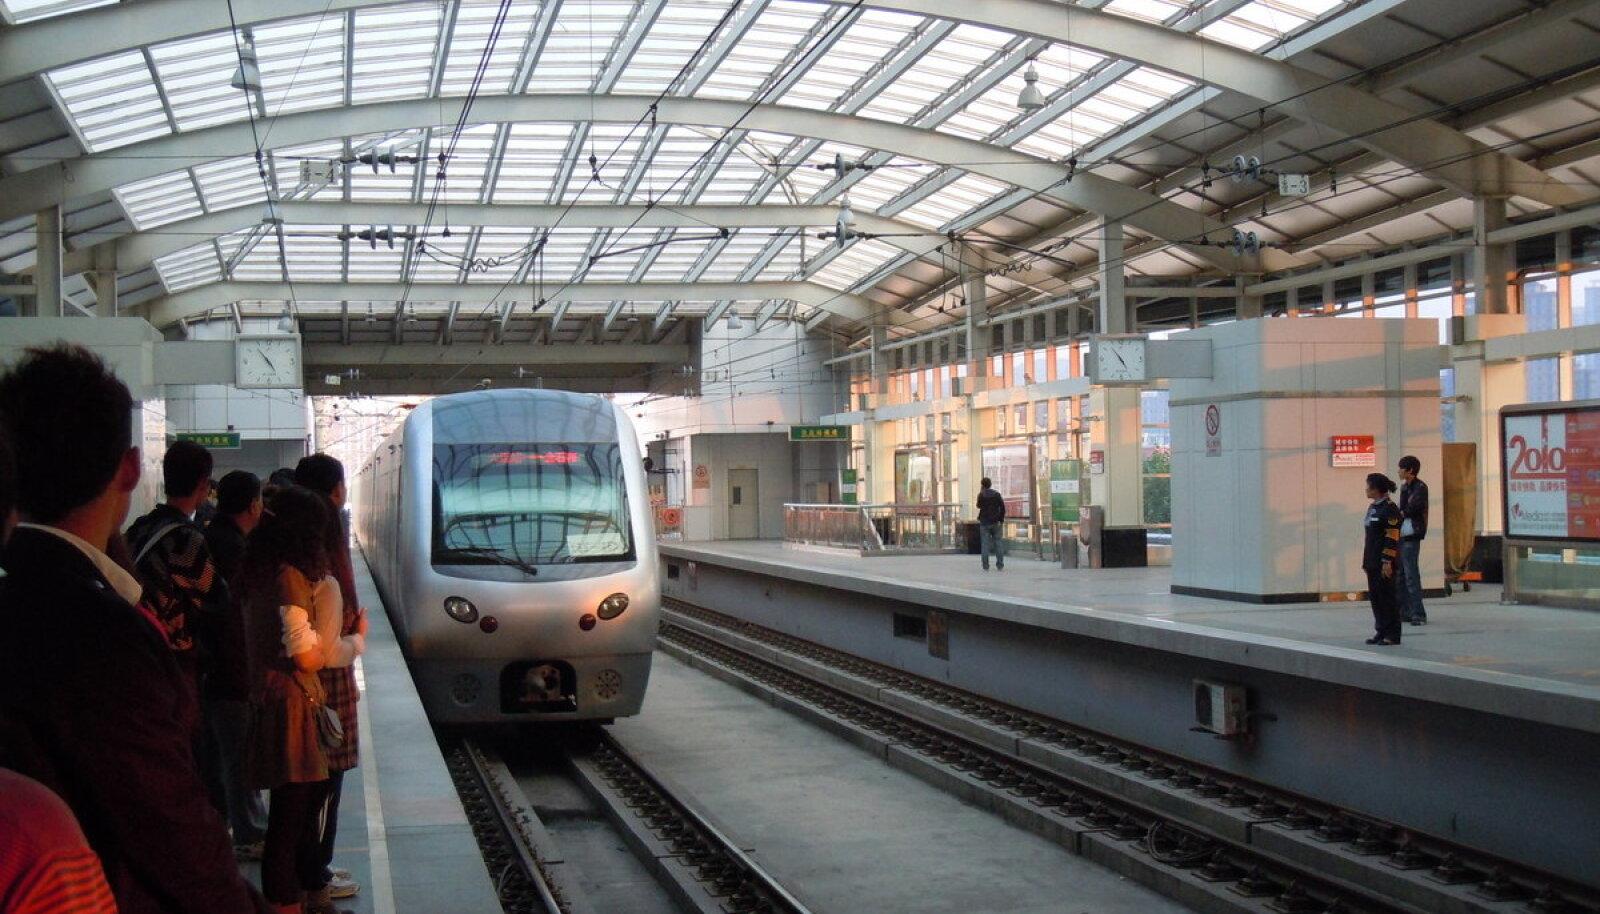 Foto: Dalian Railway